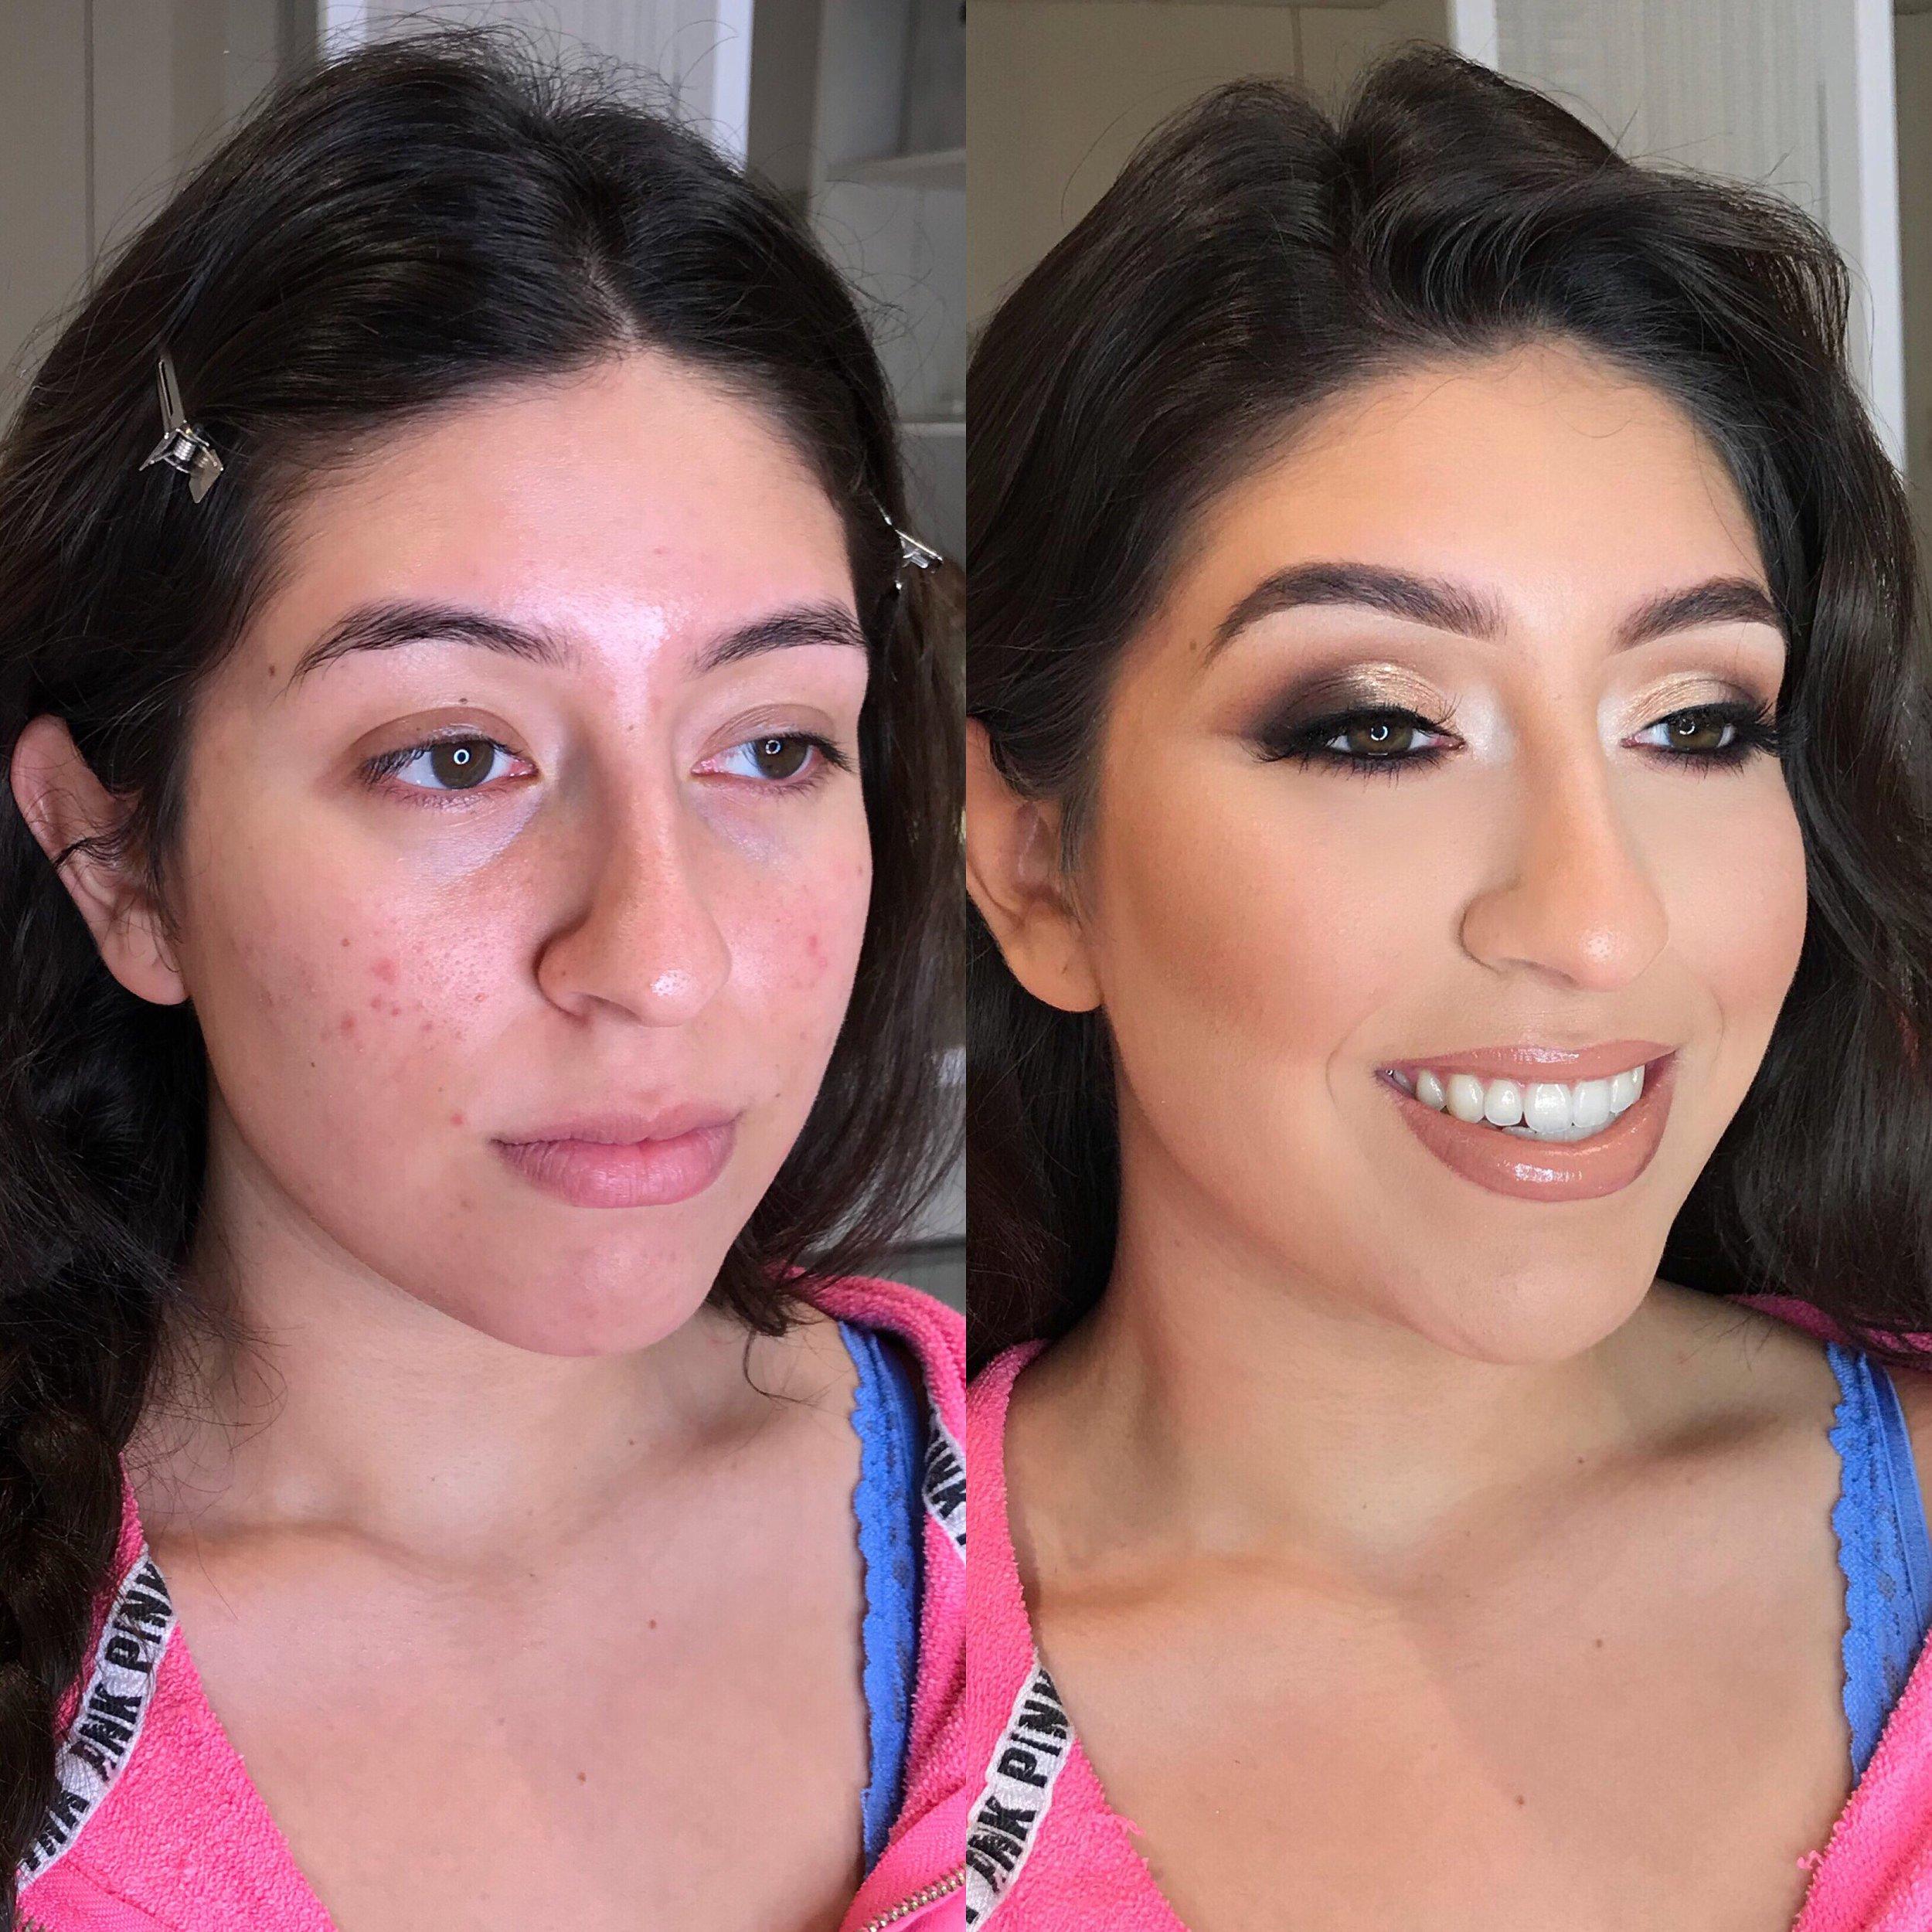 Patricia_Castro_Makeup_Los_Angeles_Makeup_Artist_33.JPG